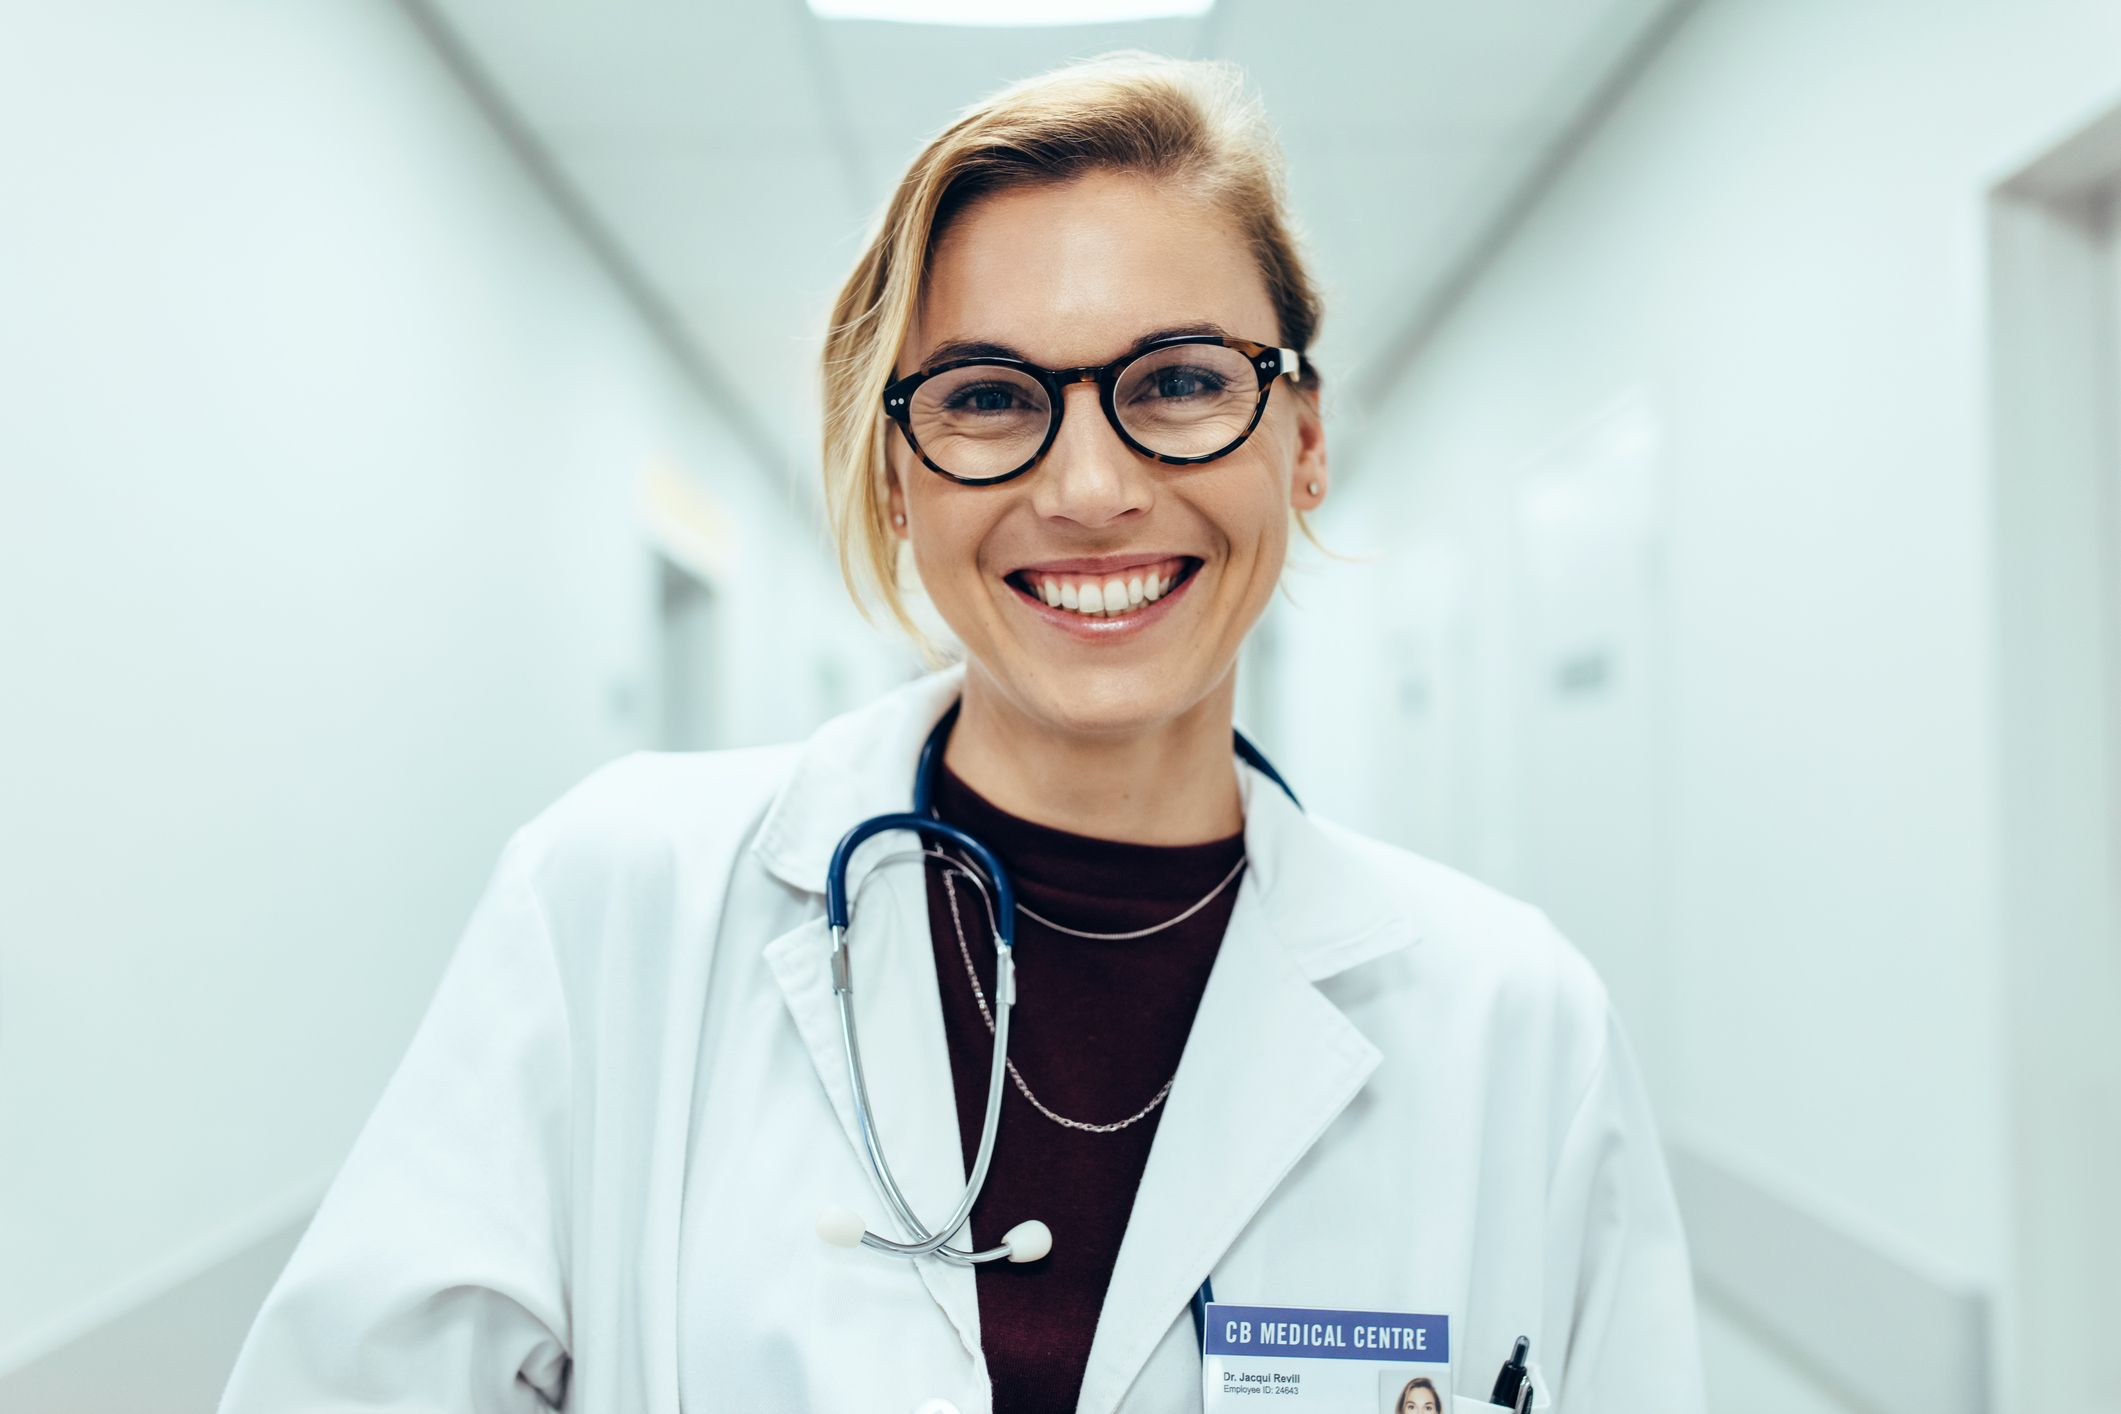 doctor-stock